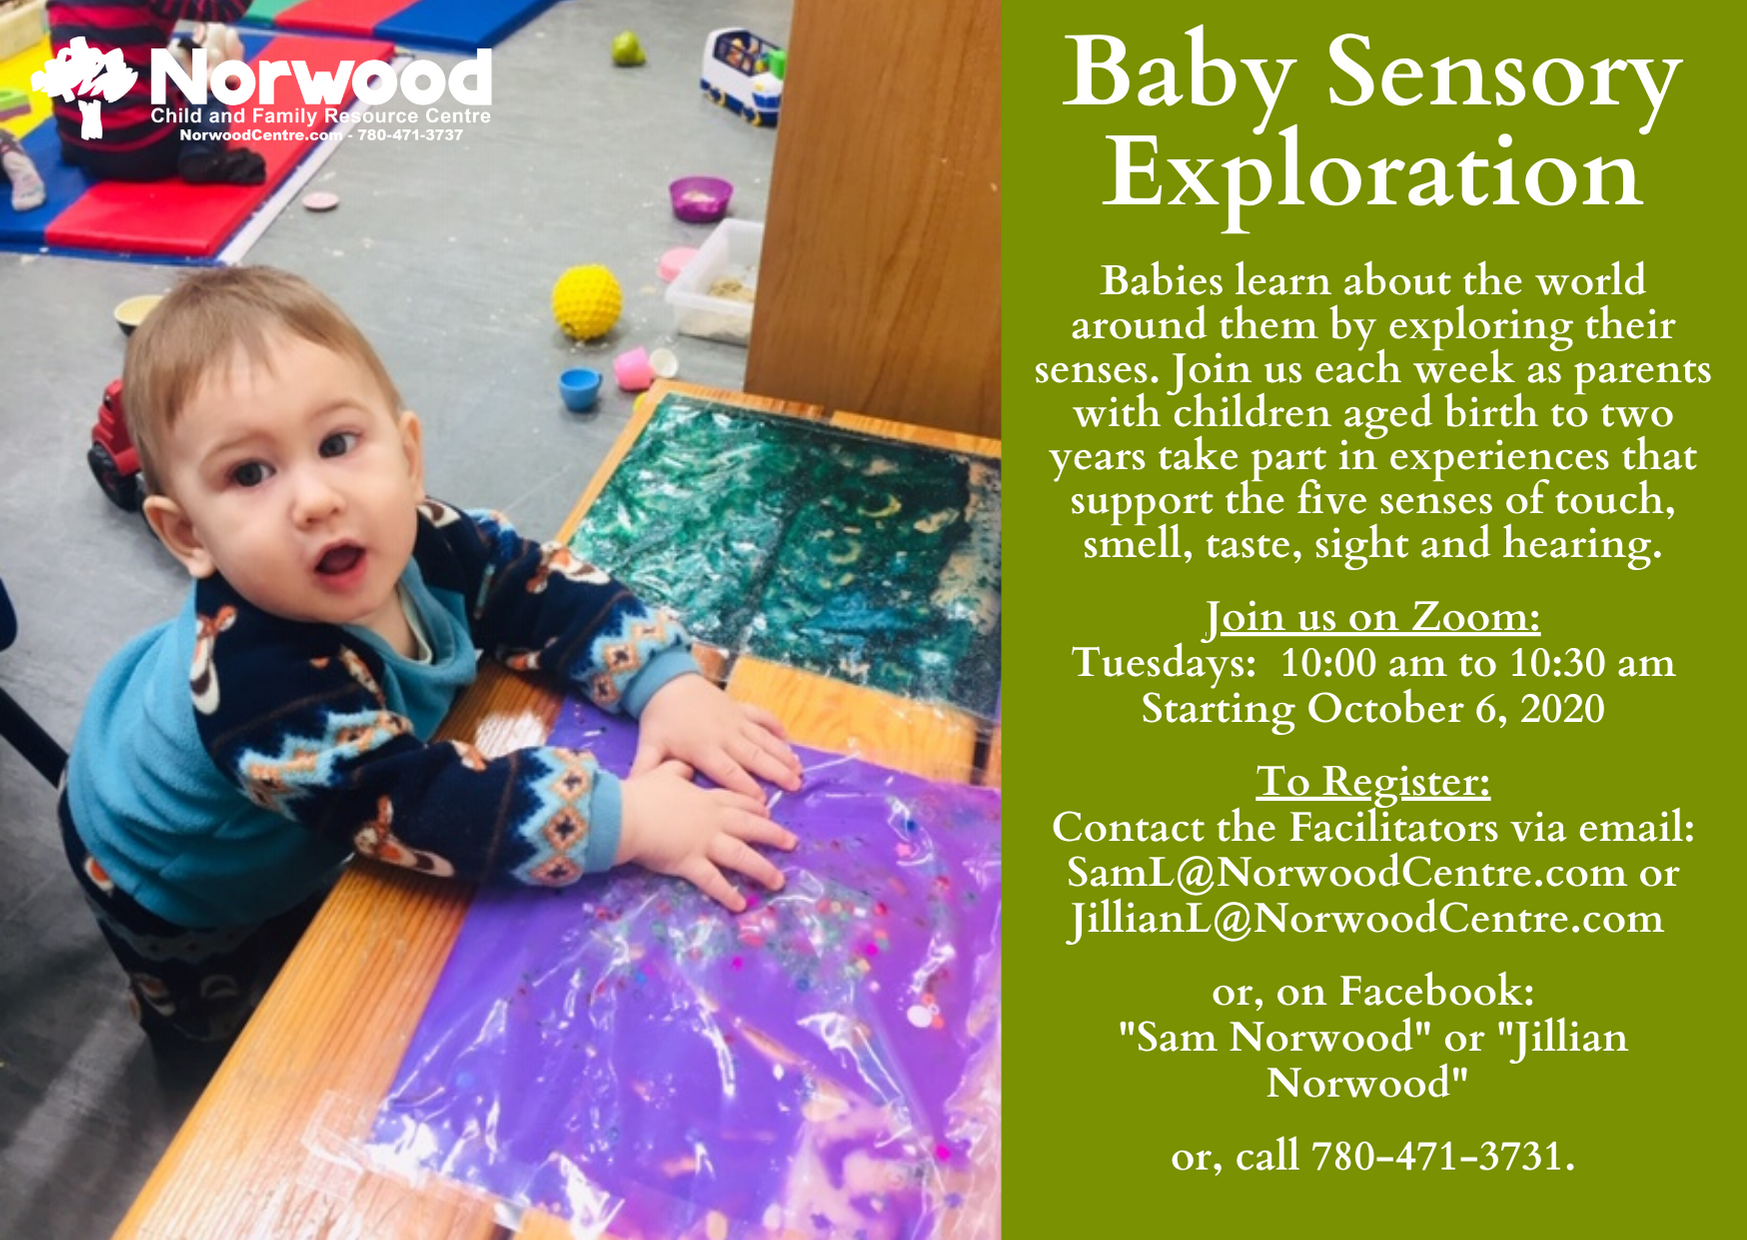 Baby Sensory Exploration